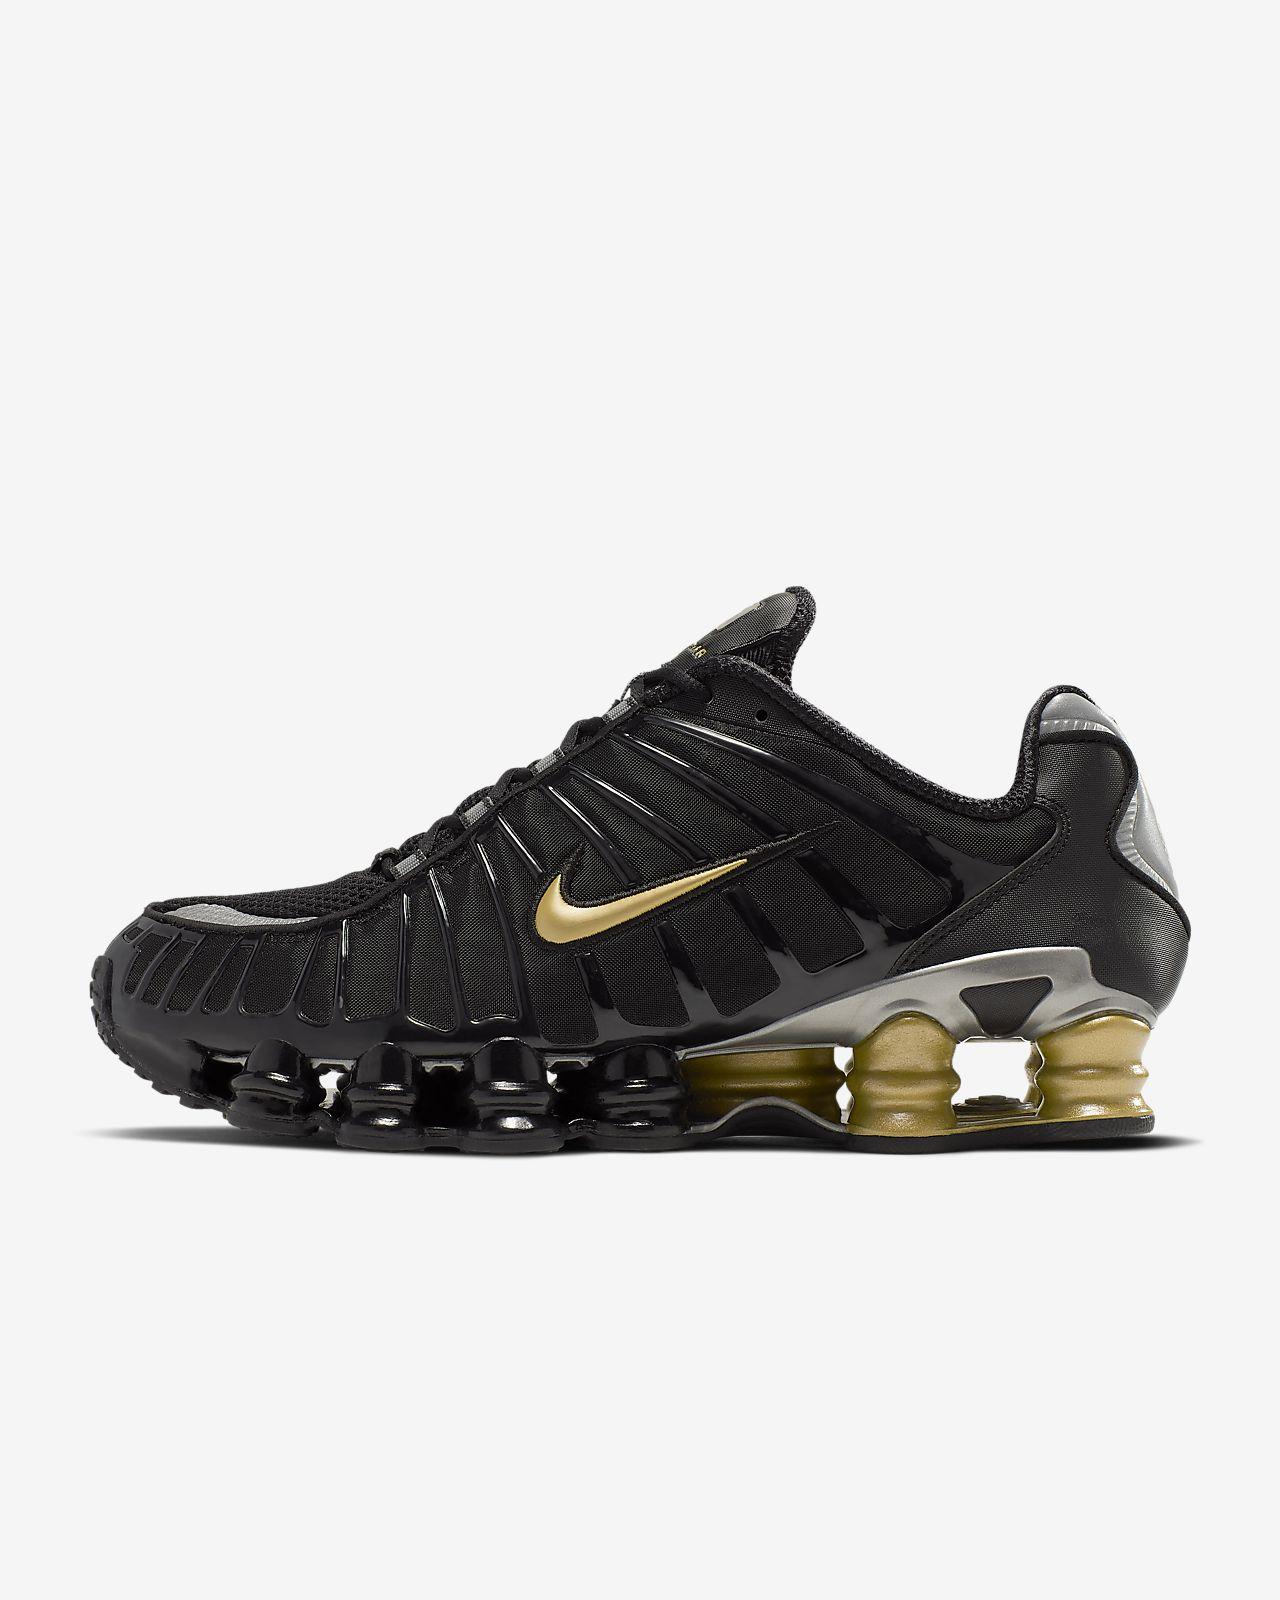 Nike Shox TL Neymar Jr. Shoe